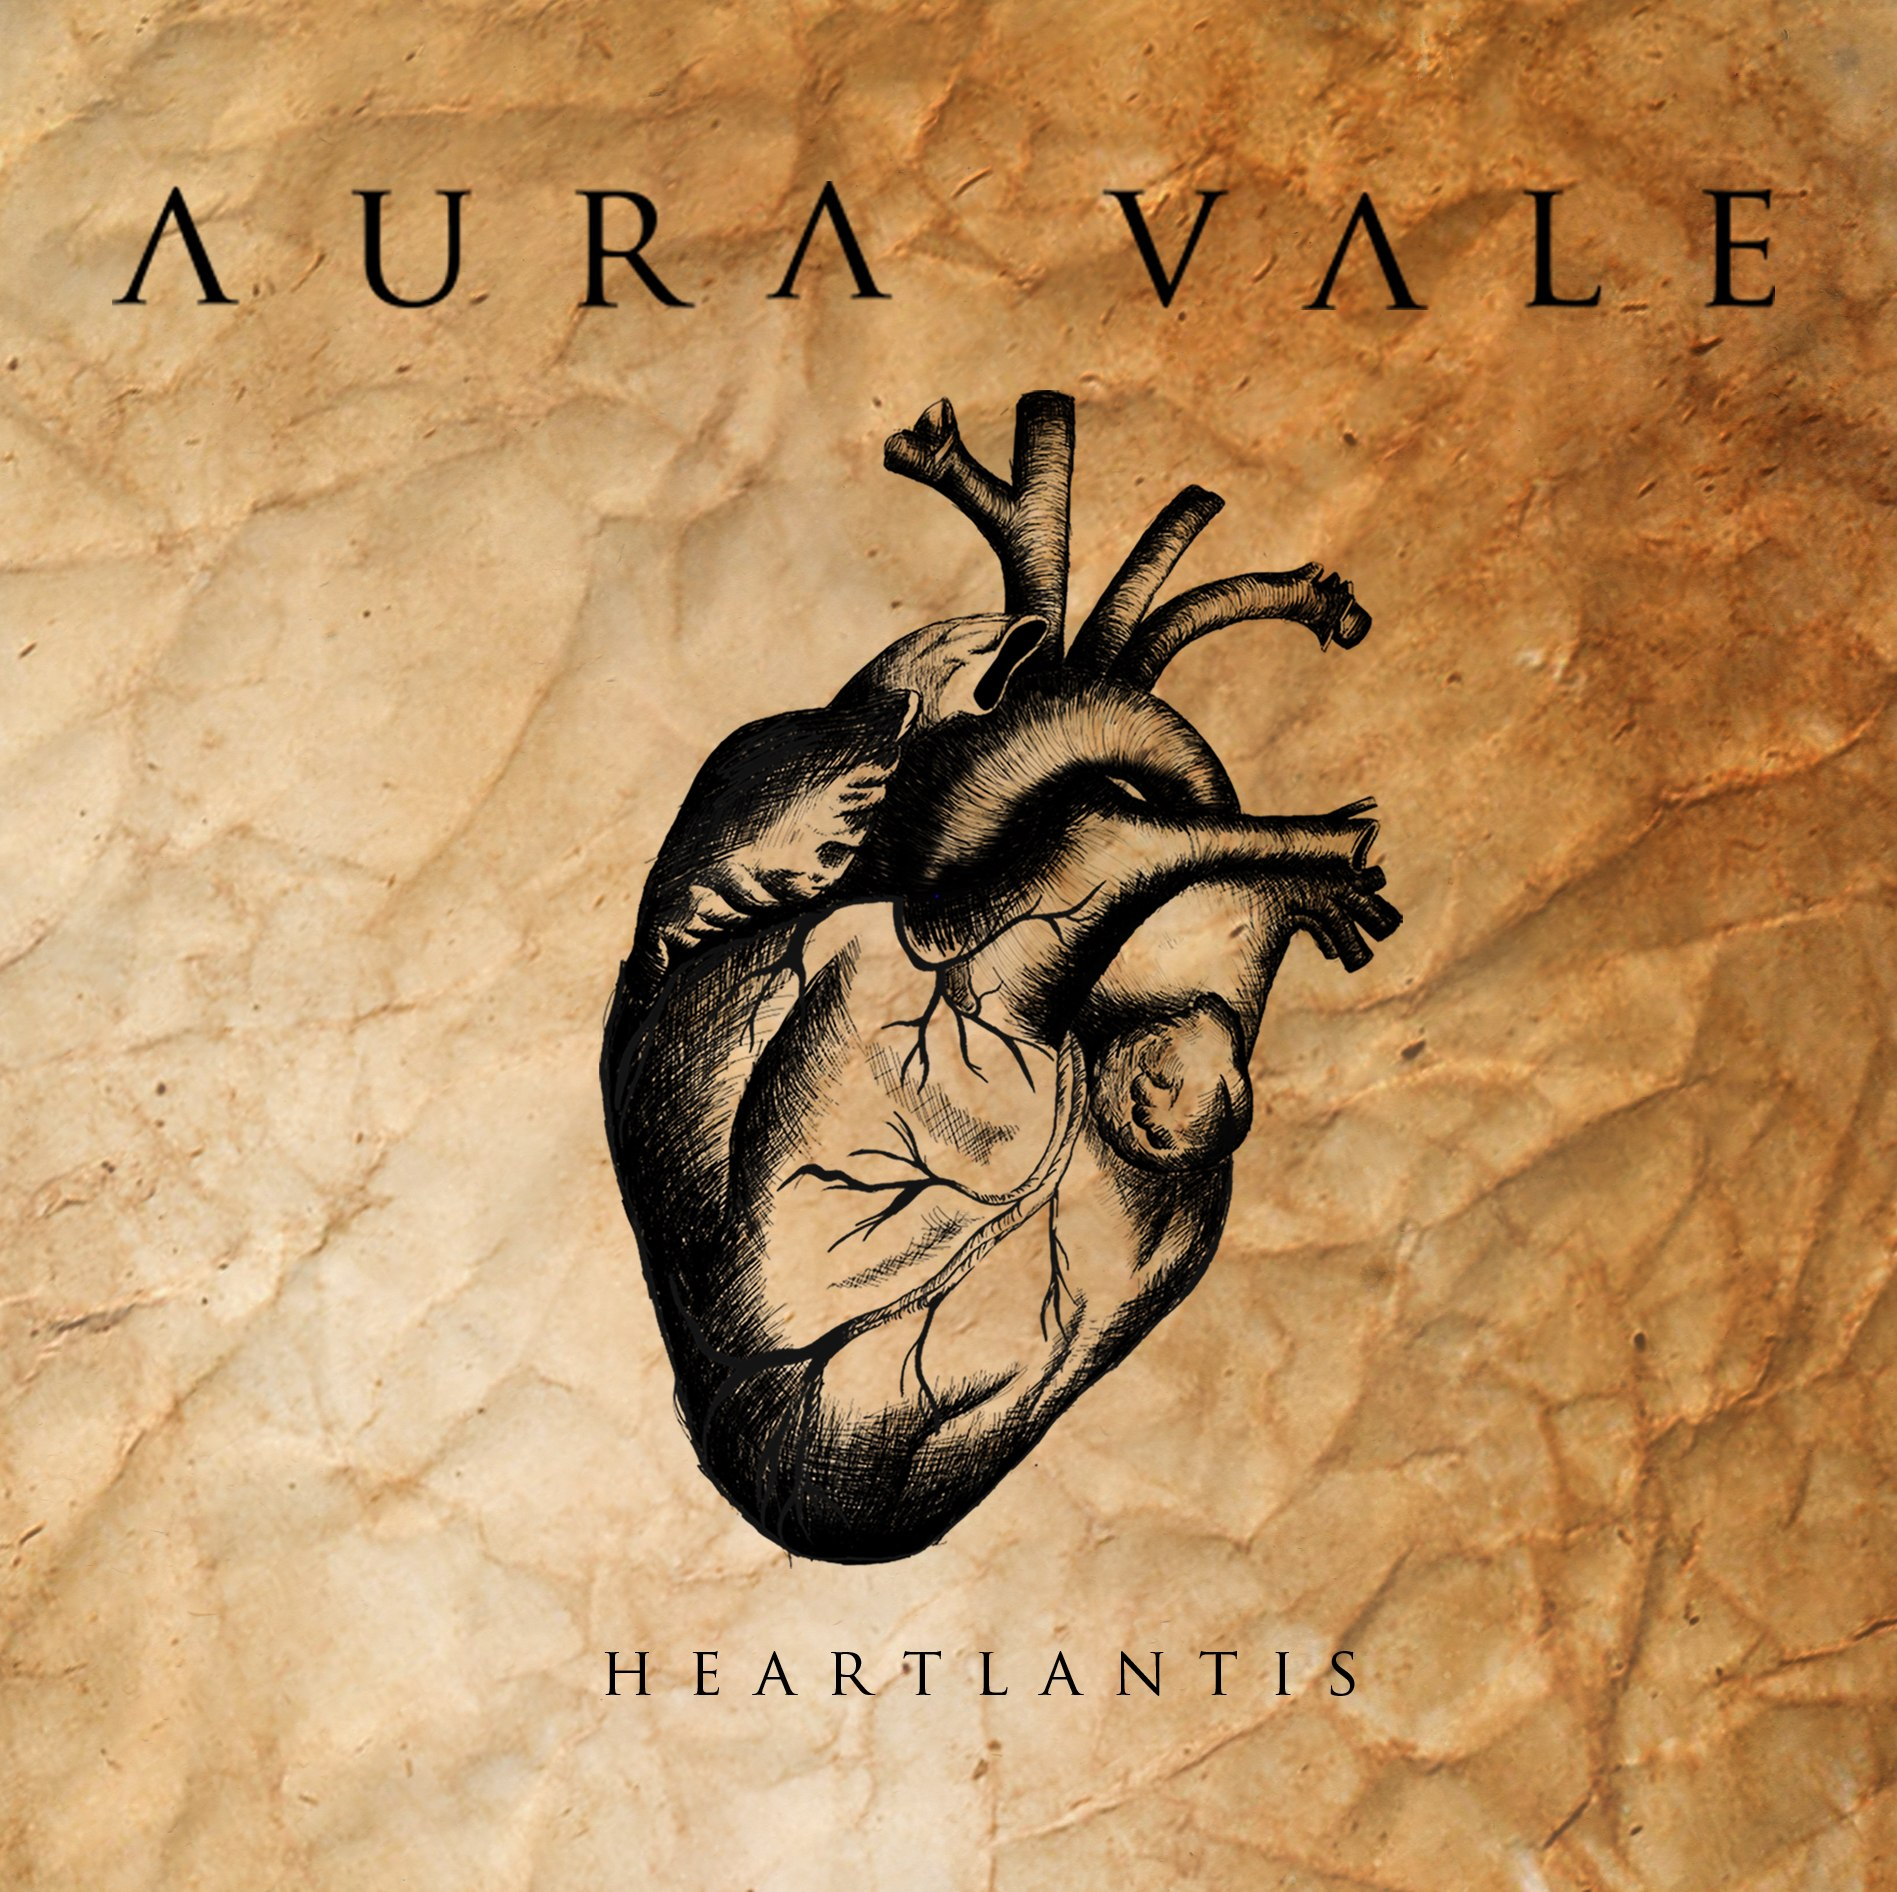 Aura Vale - Heartlantis (2012)